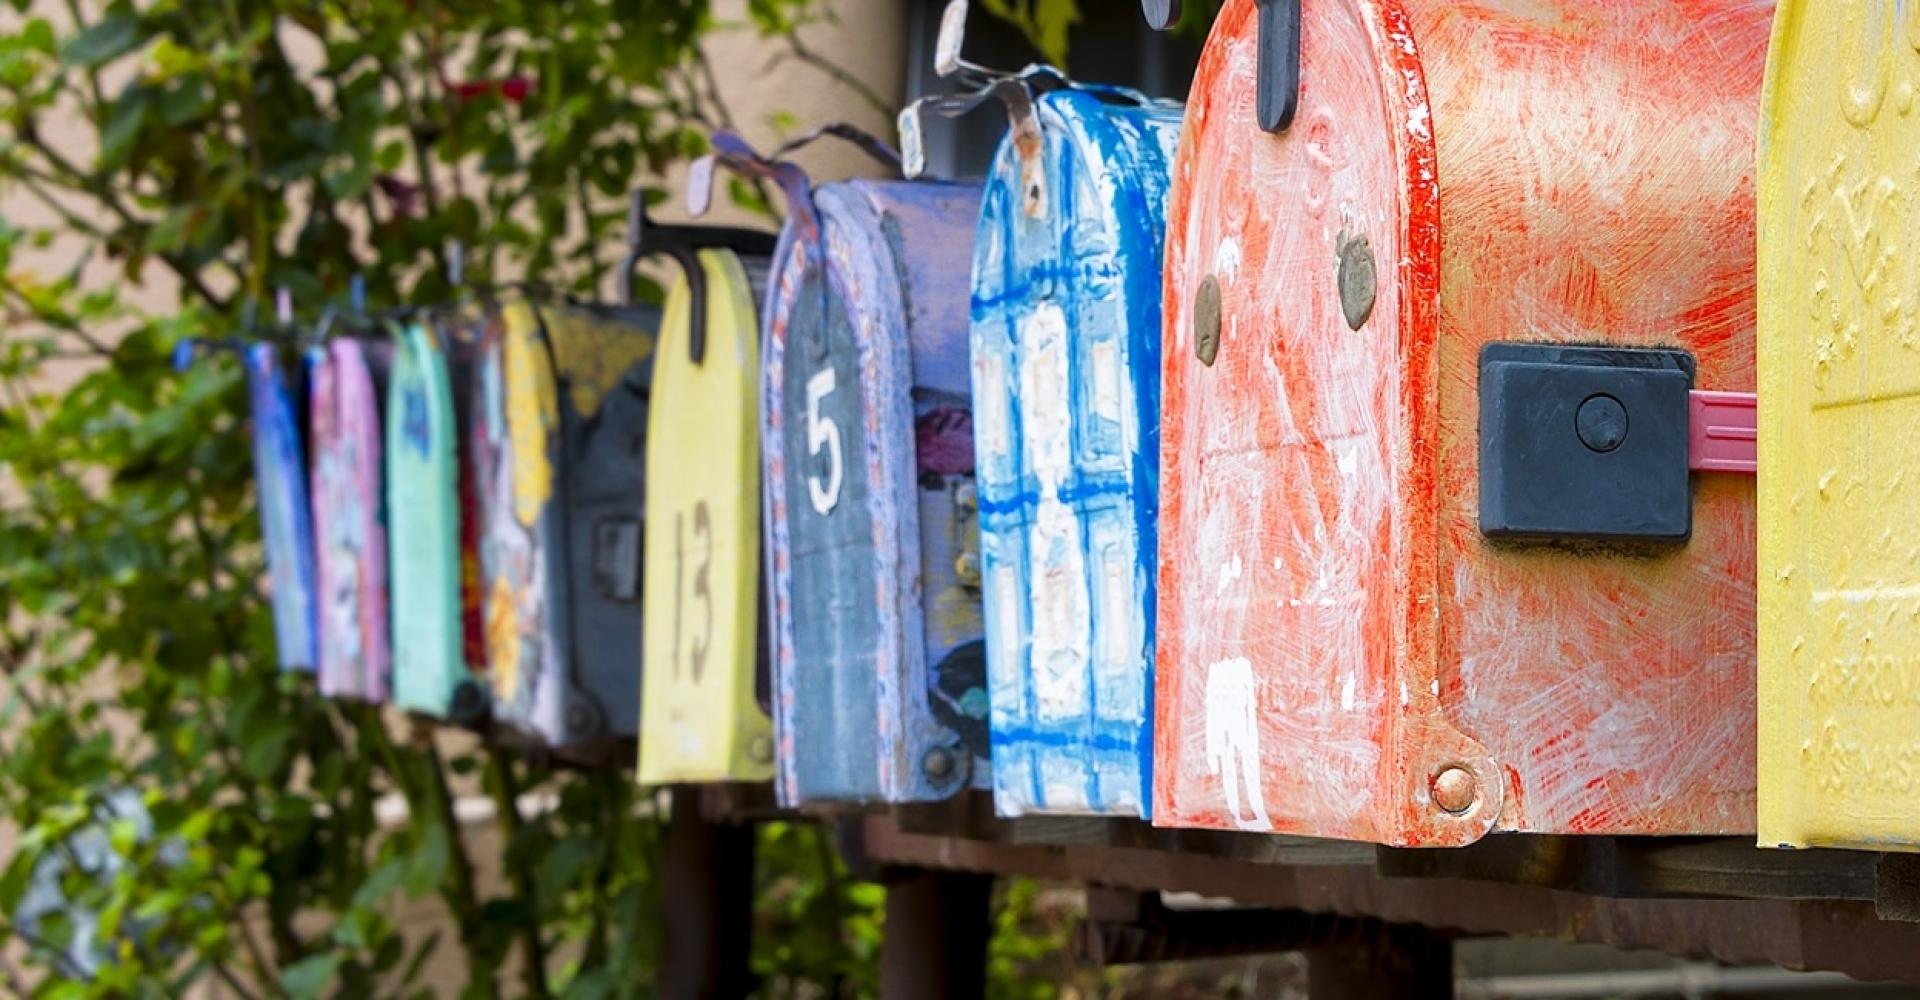 Mailbox Master | Trainingen in e-mailbeheer